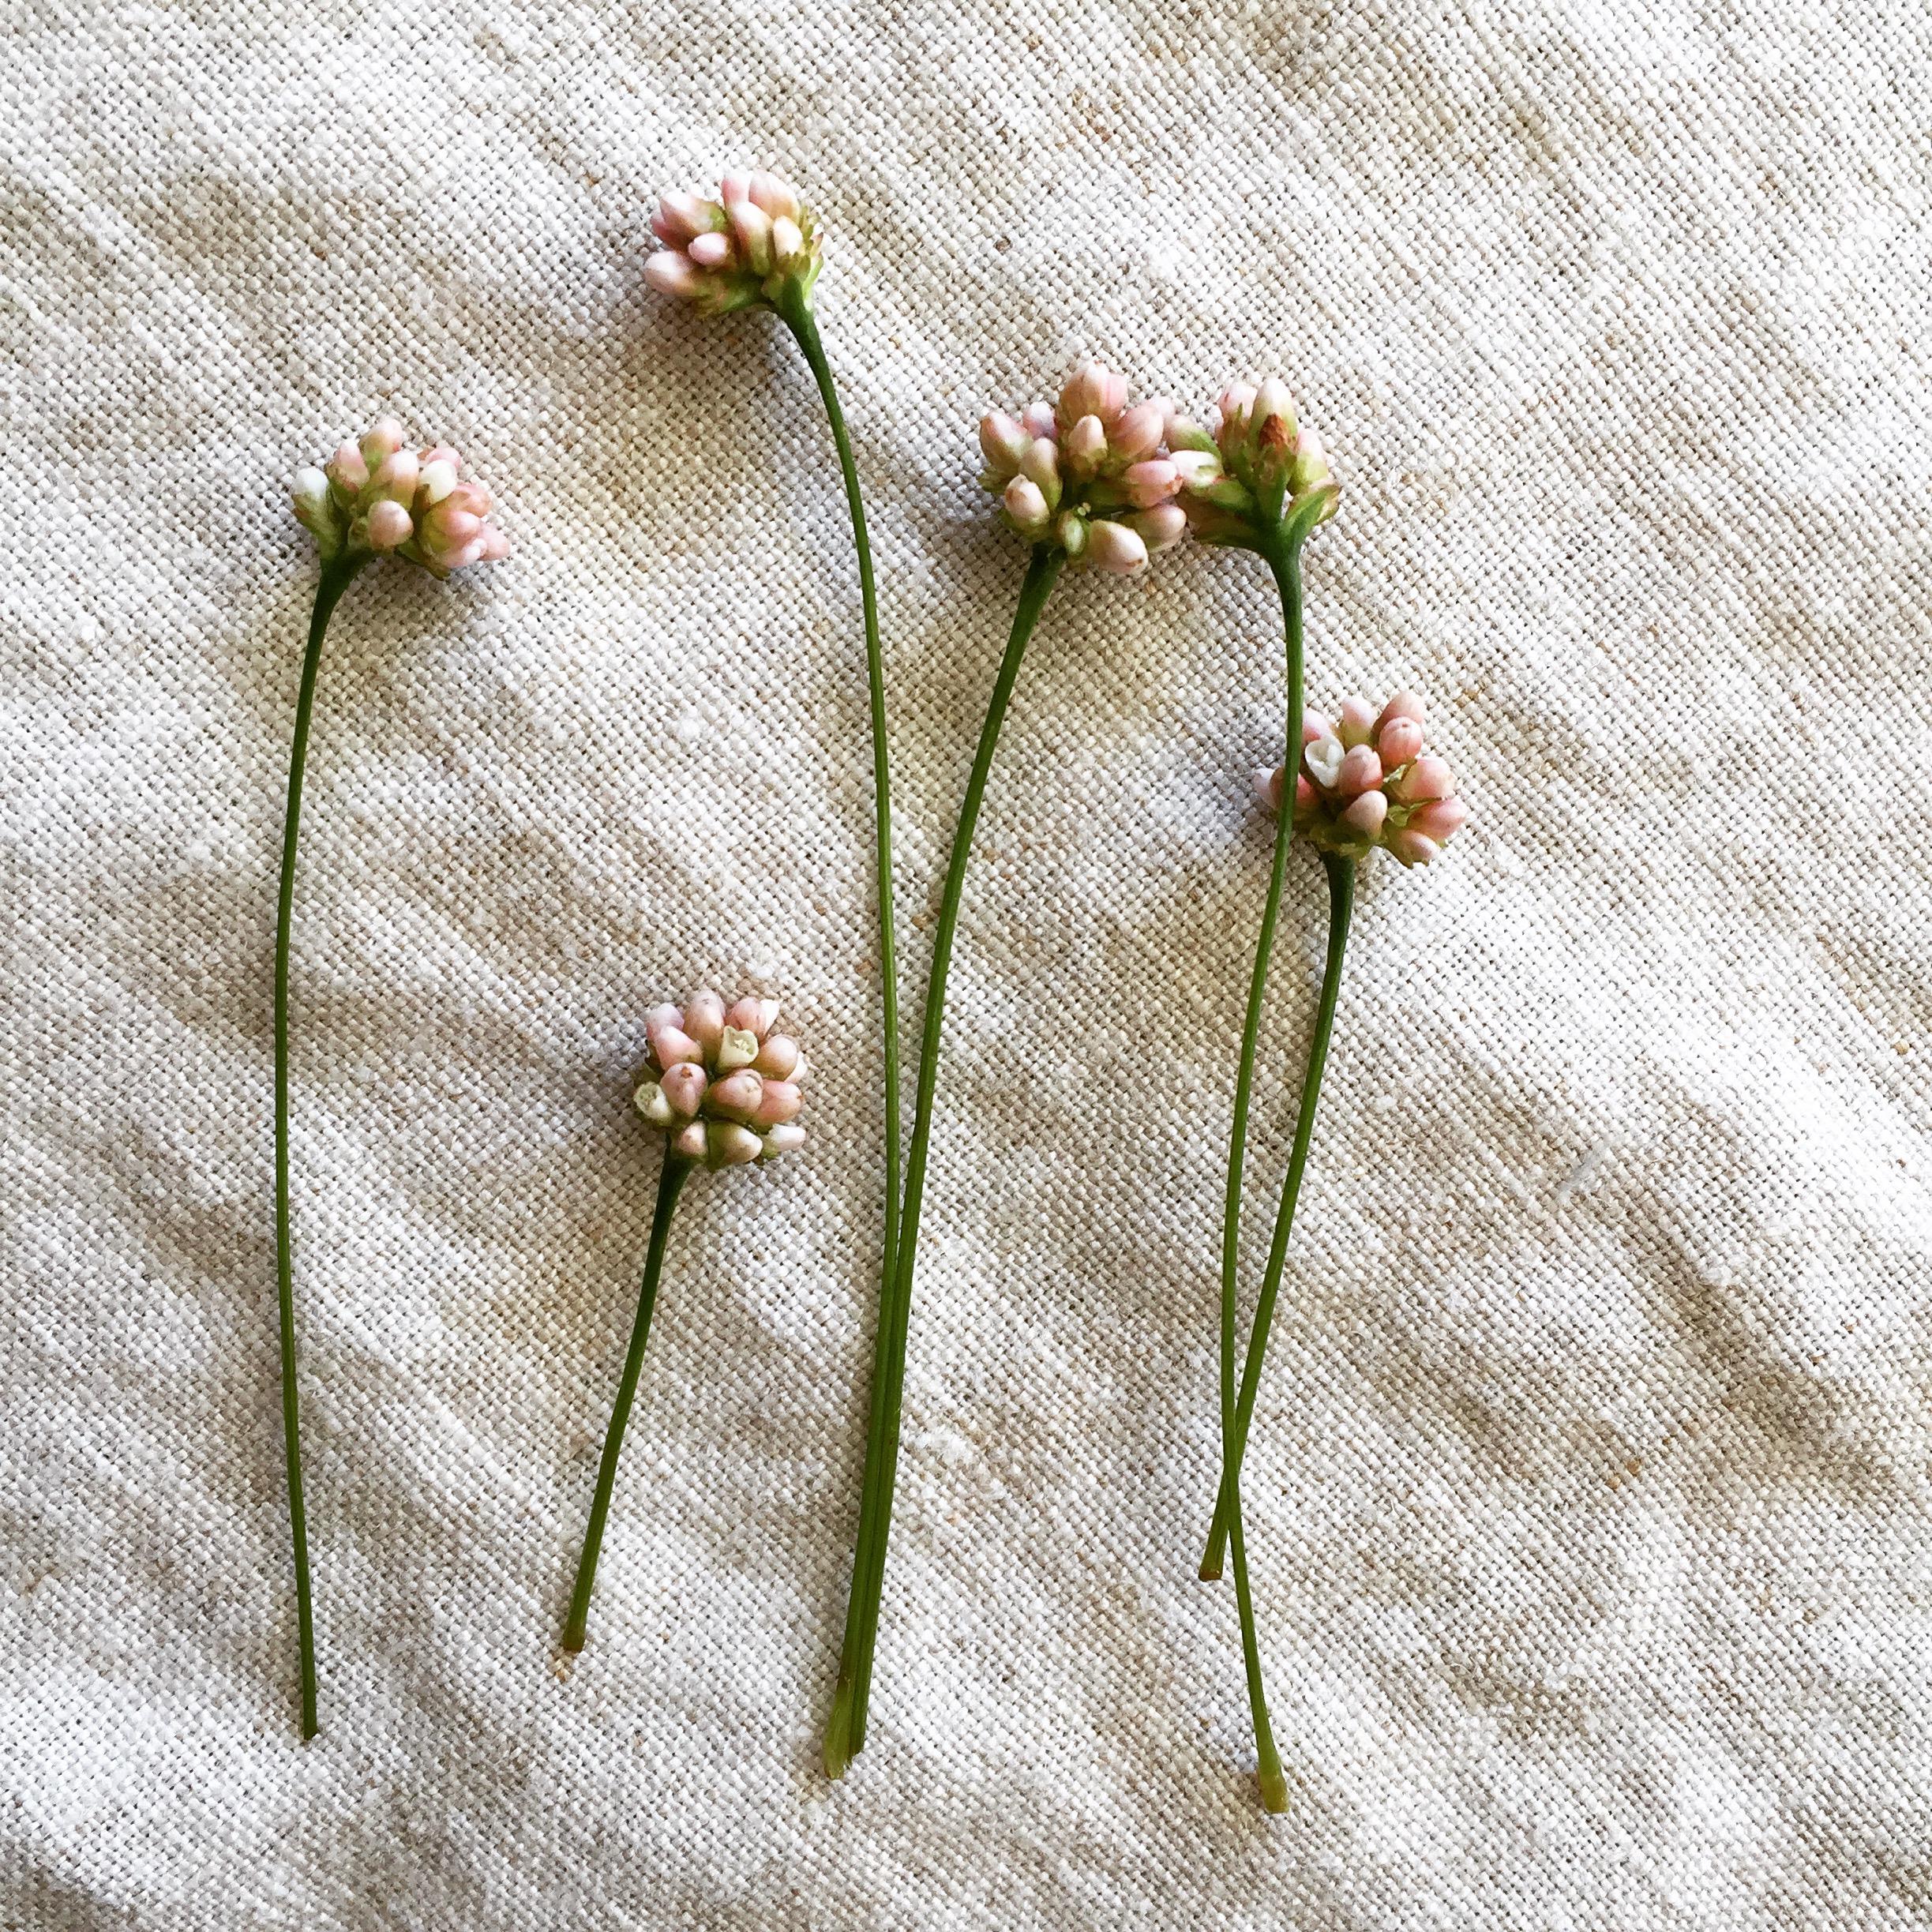 Pennsylvania Smartweed flowers